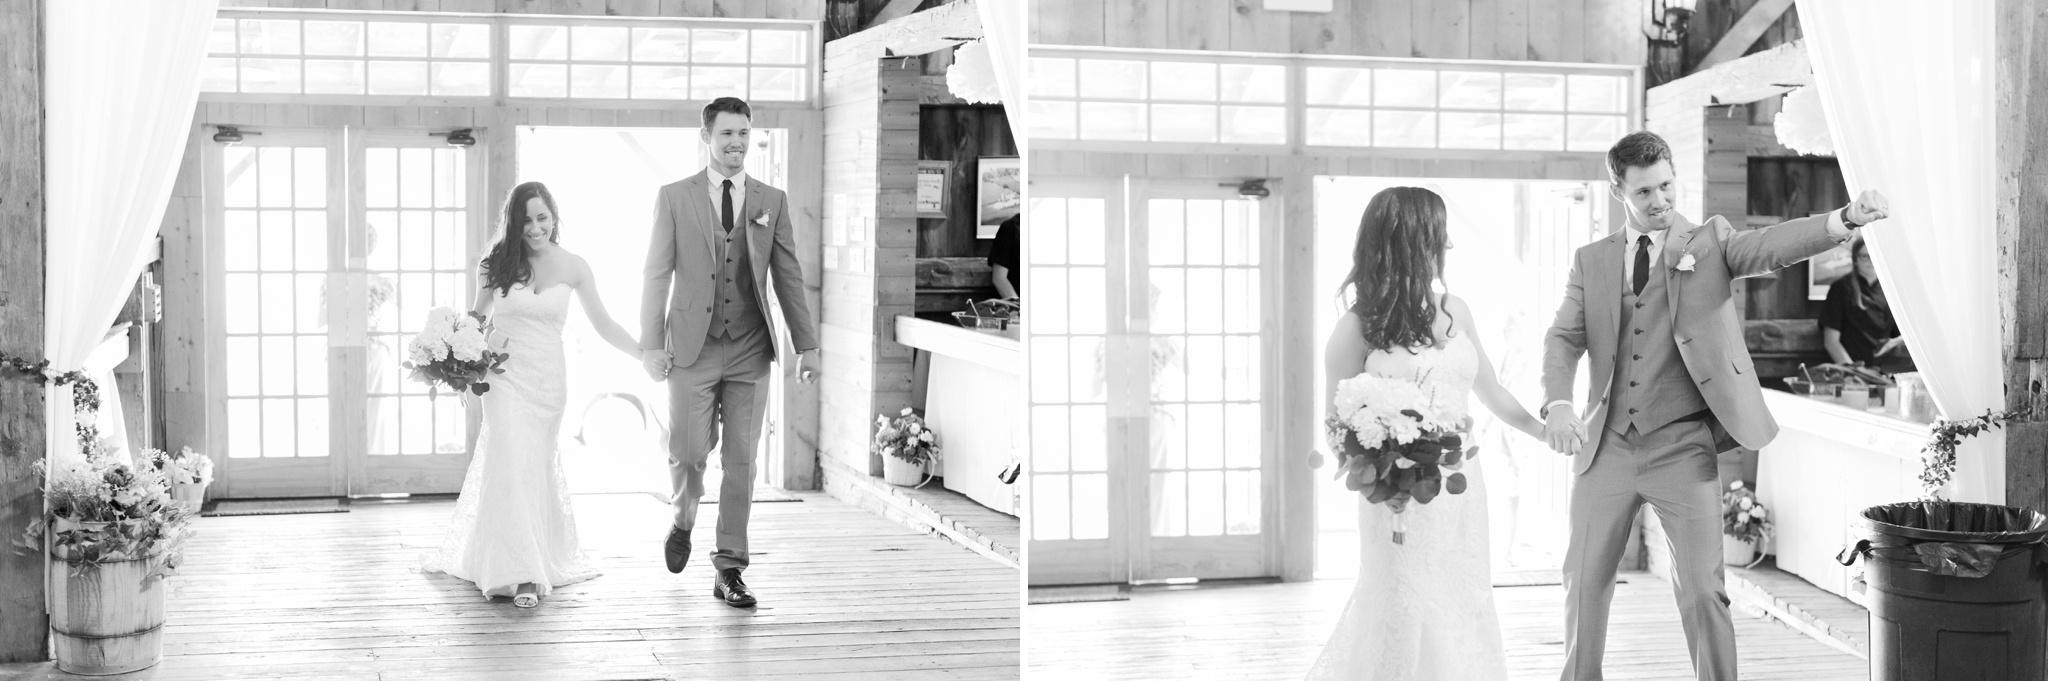 niederman-farm-wedding-cincinnati-ohio-photographer_0093.jpg